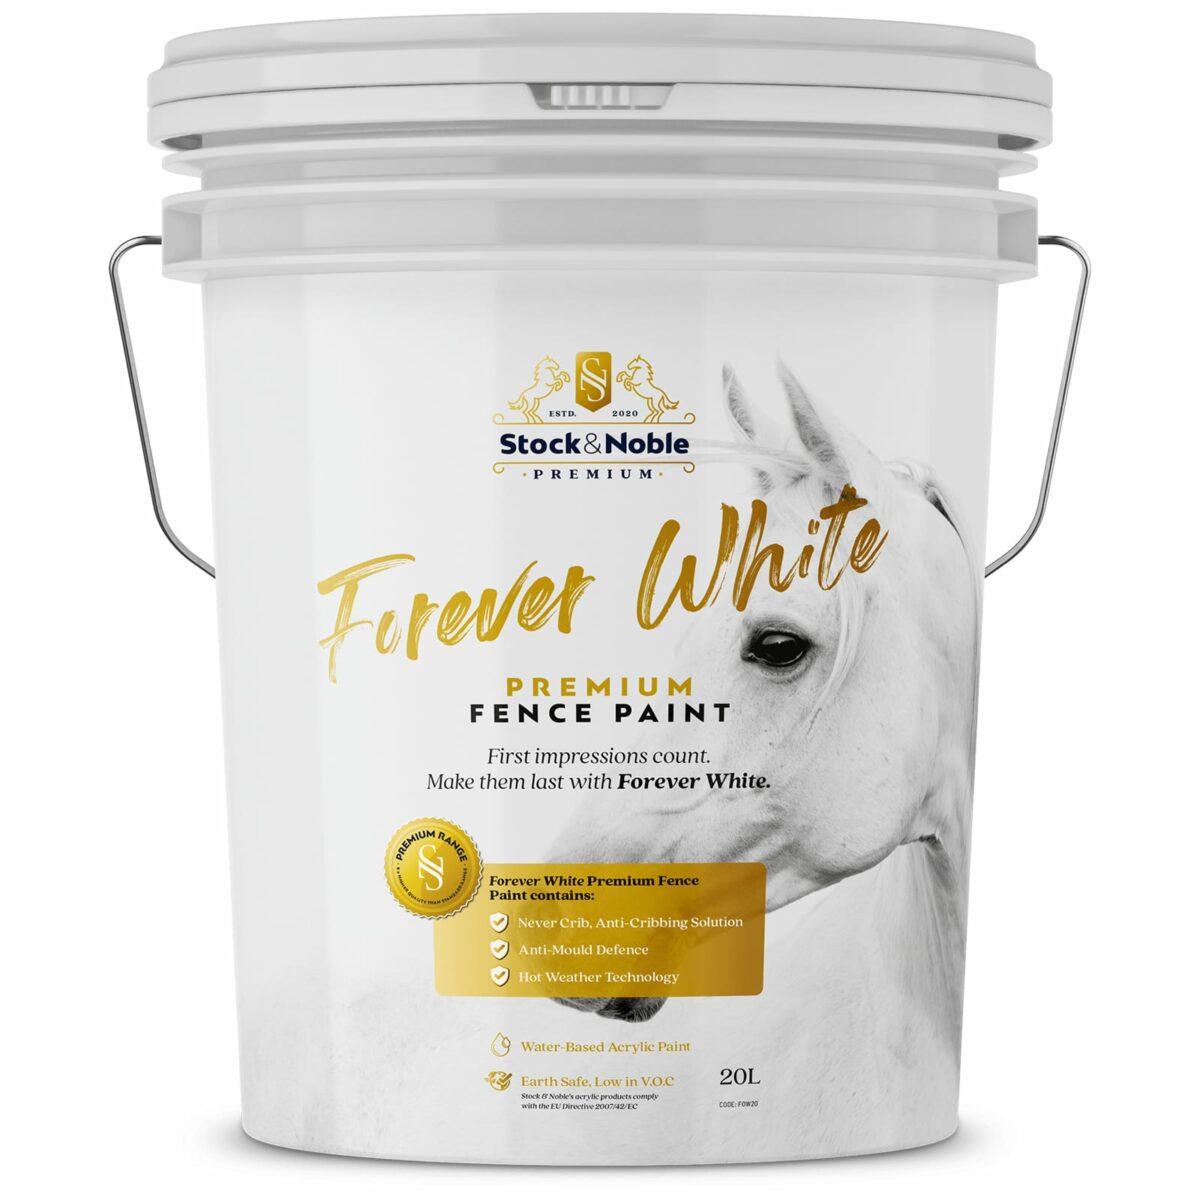 Master Blend Fence Paint Forever White Design - Stock and Noble